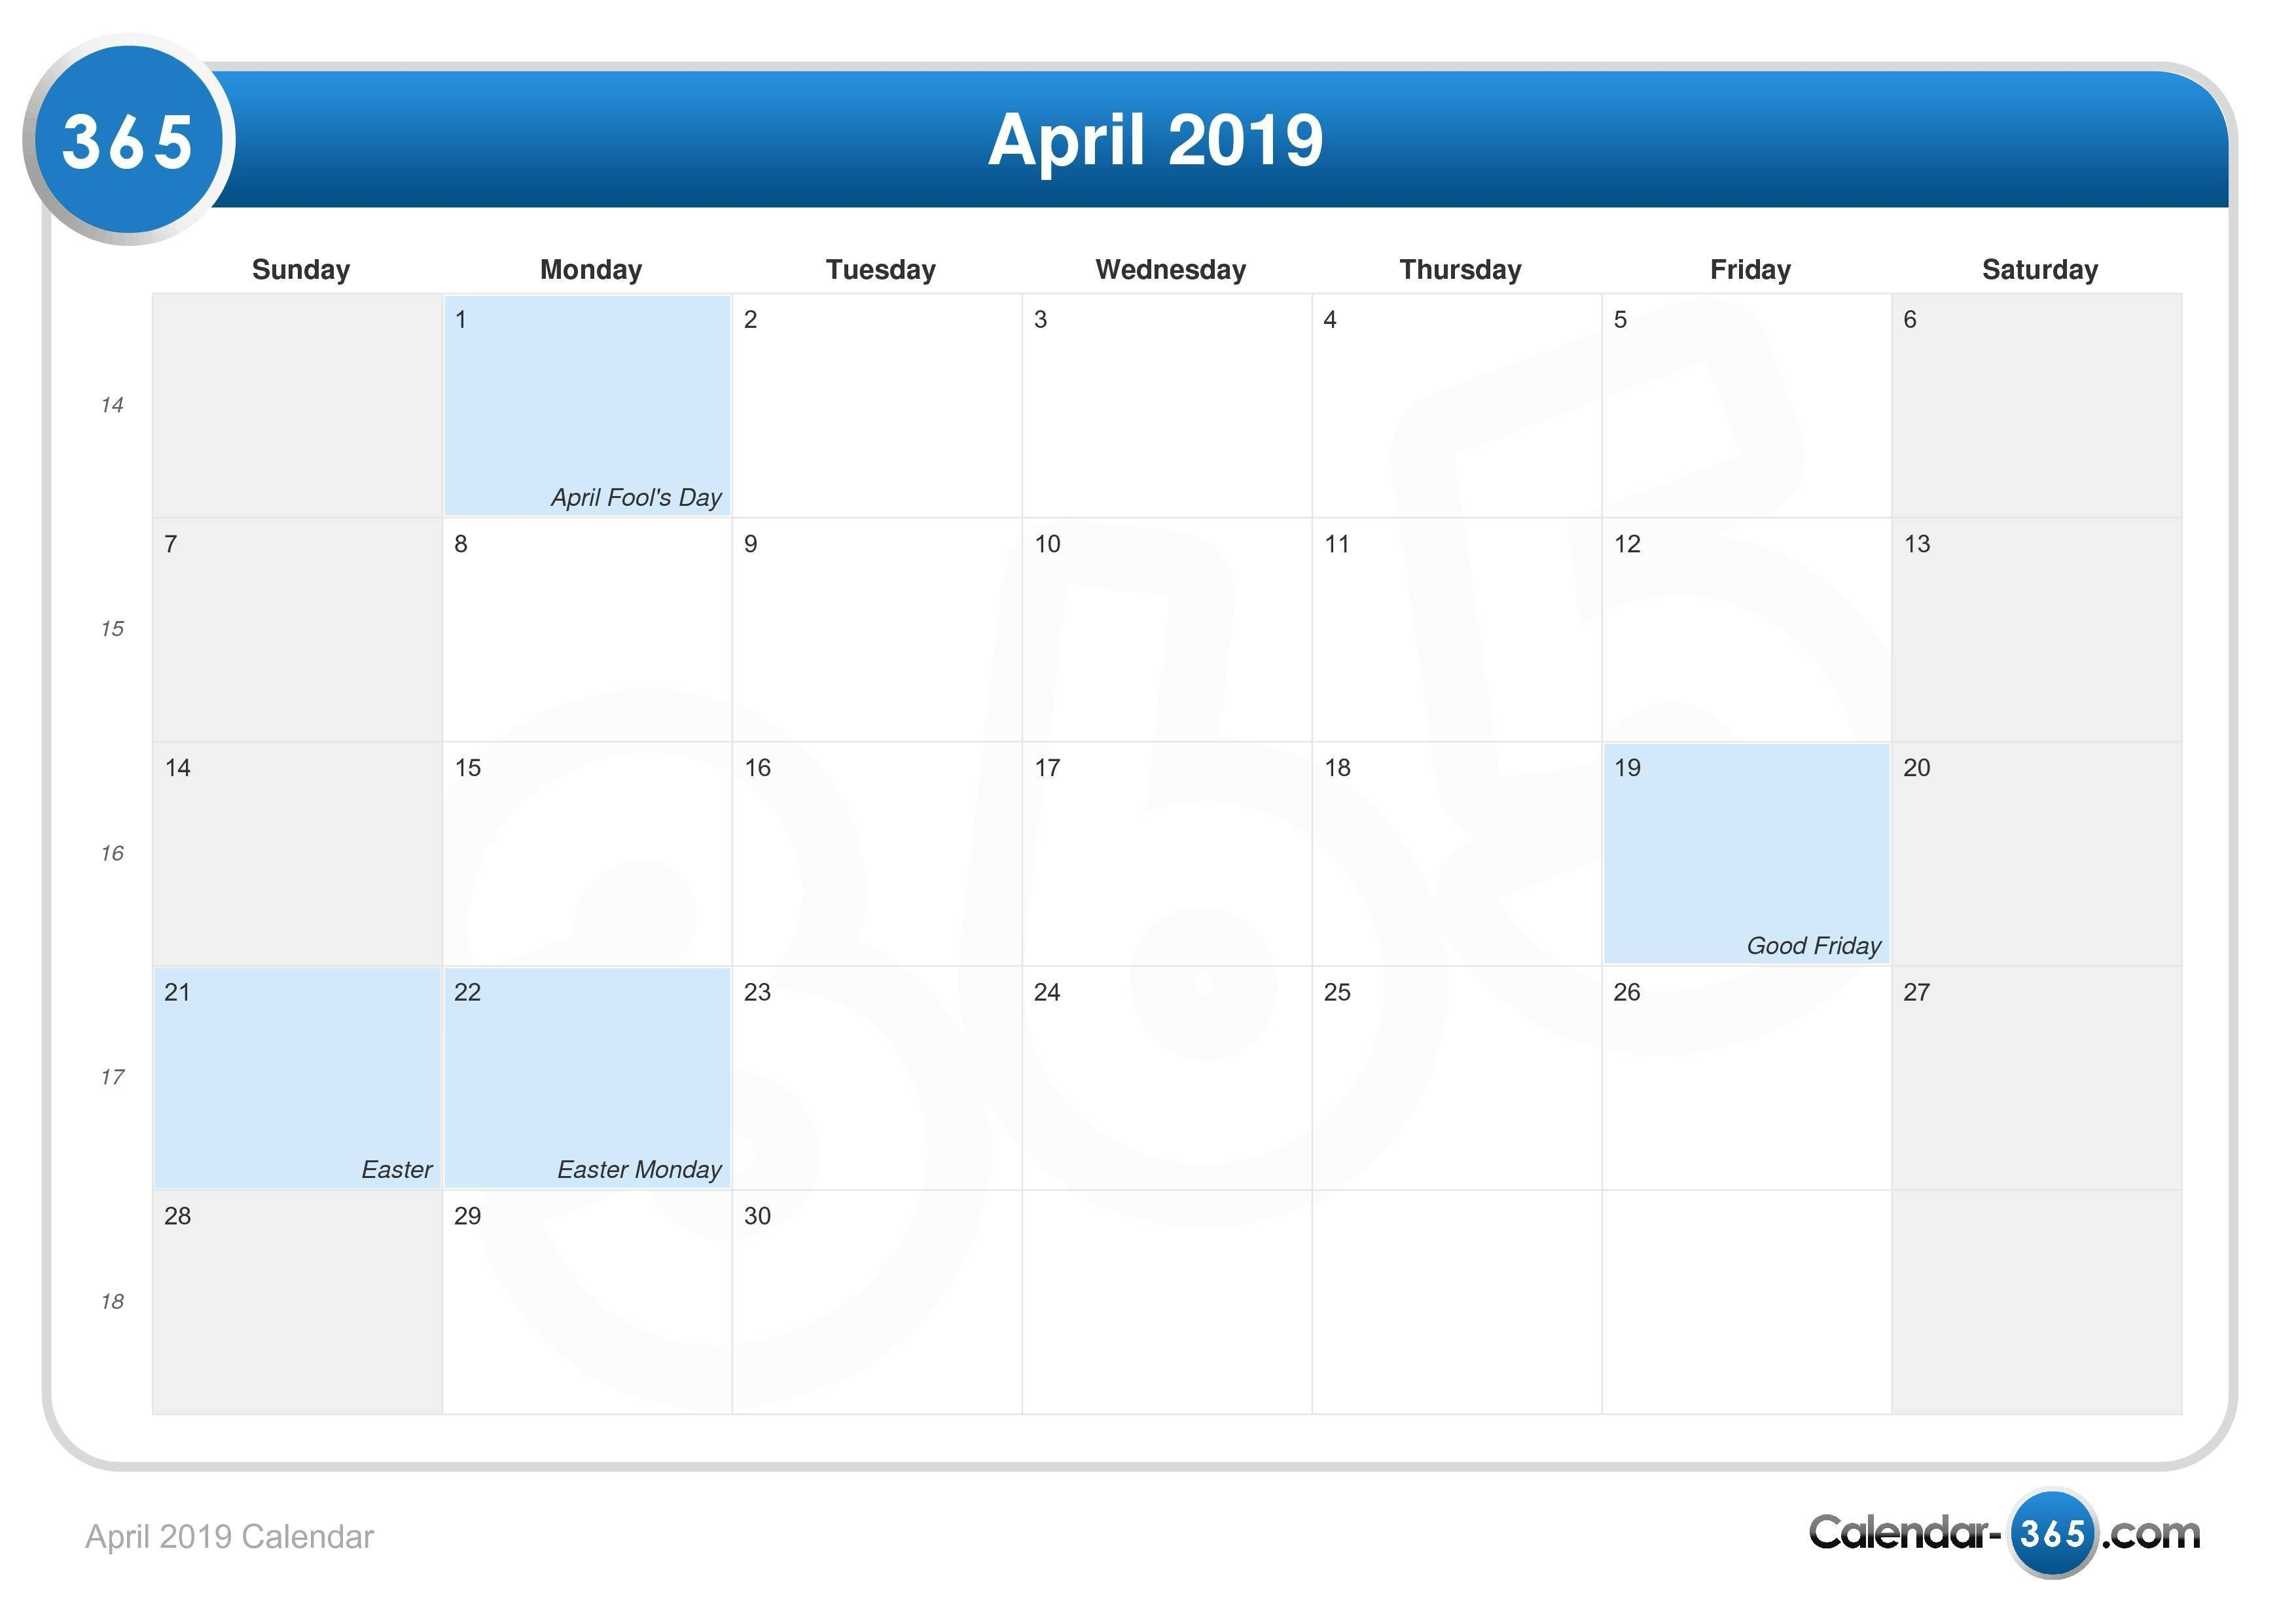 April 2019 Calendar Feb 6 2019 Calendar